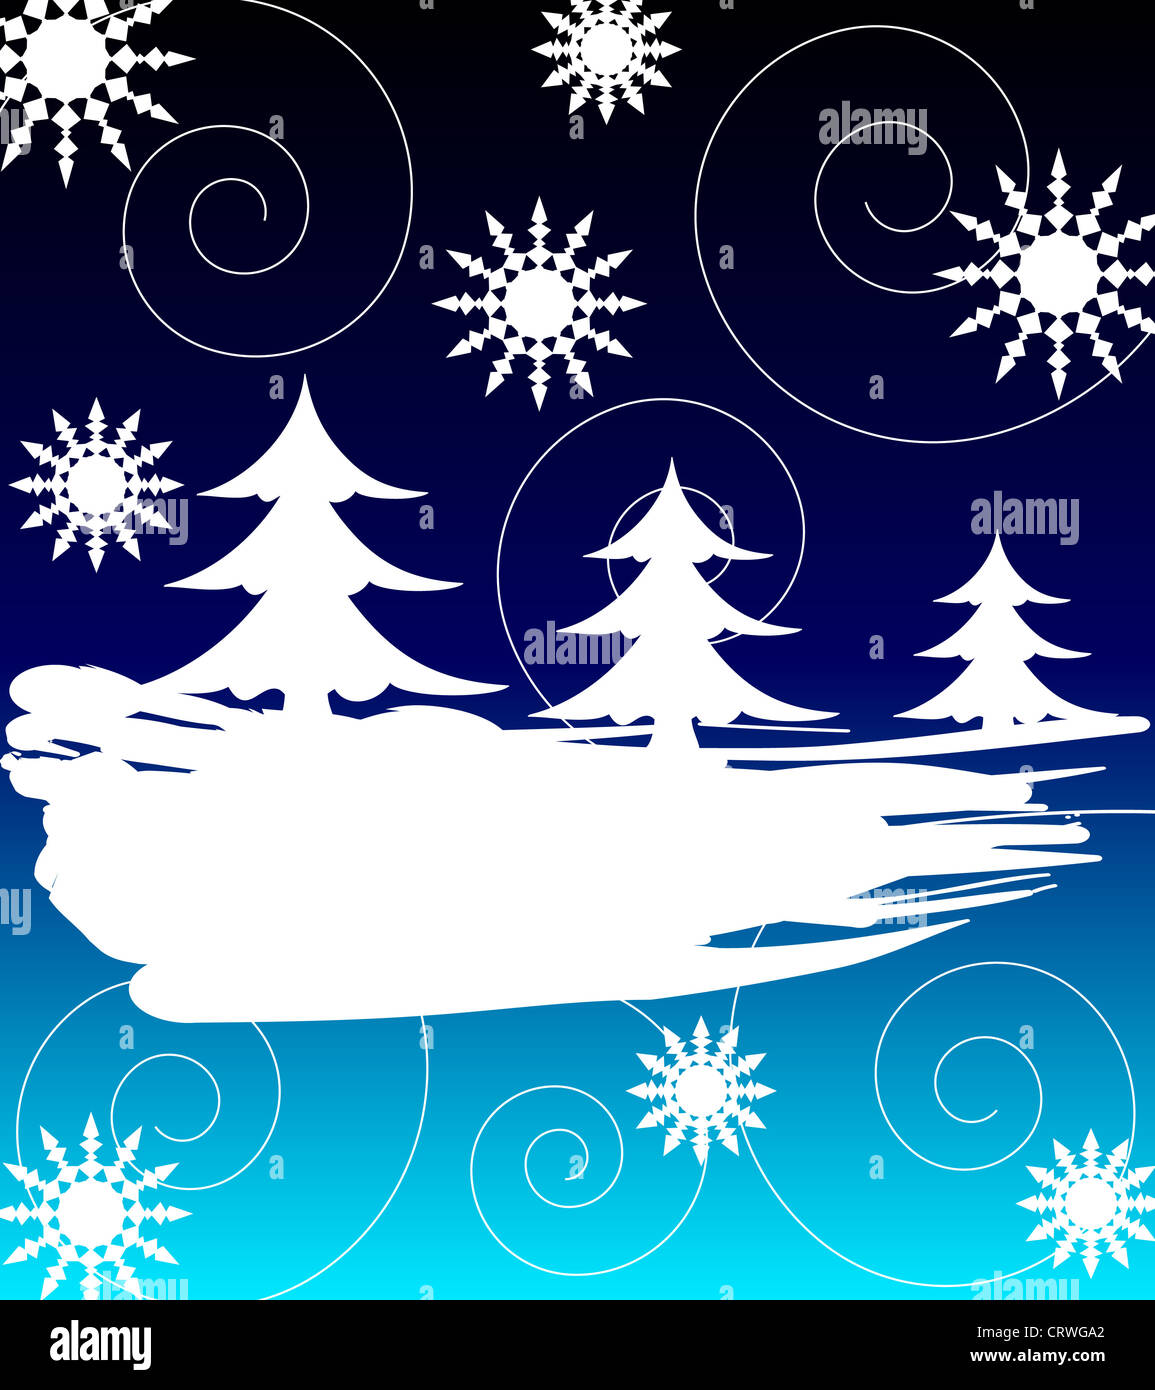 Christmas trees and stars design Stock Photo